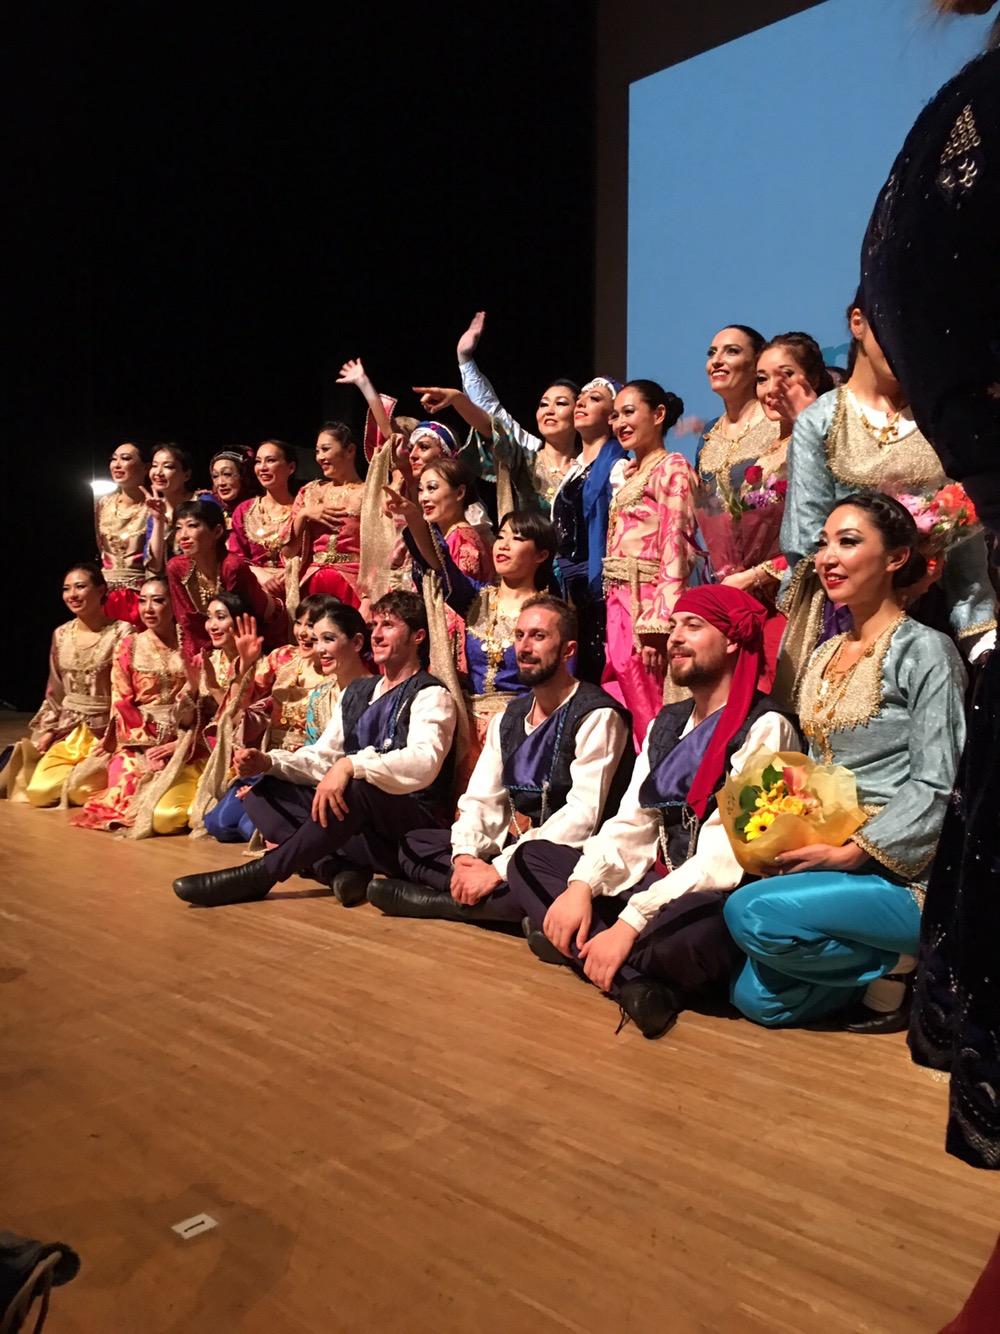 トルコ民族舞踊Hoppa東京